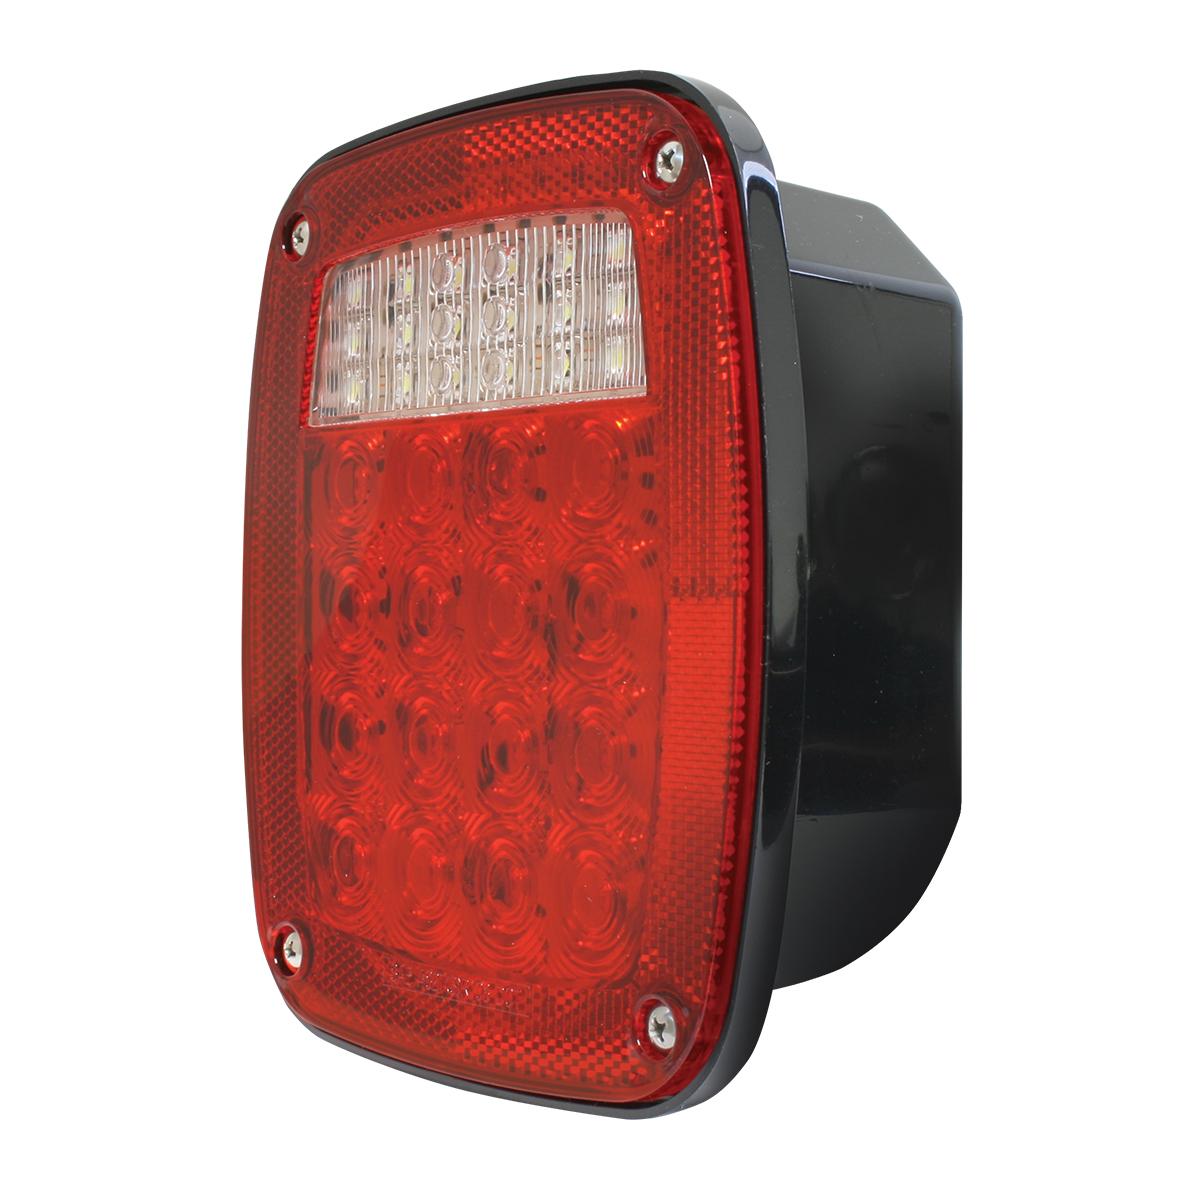 80796 Multi-Function Combination LED Light